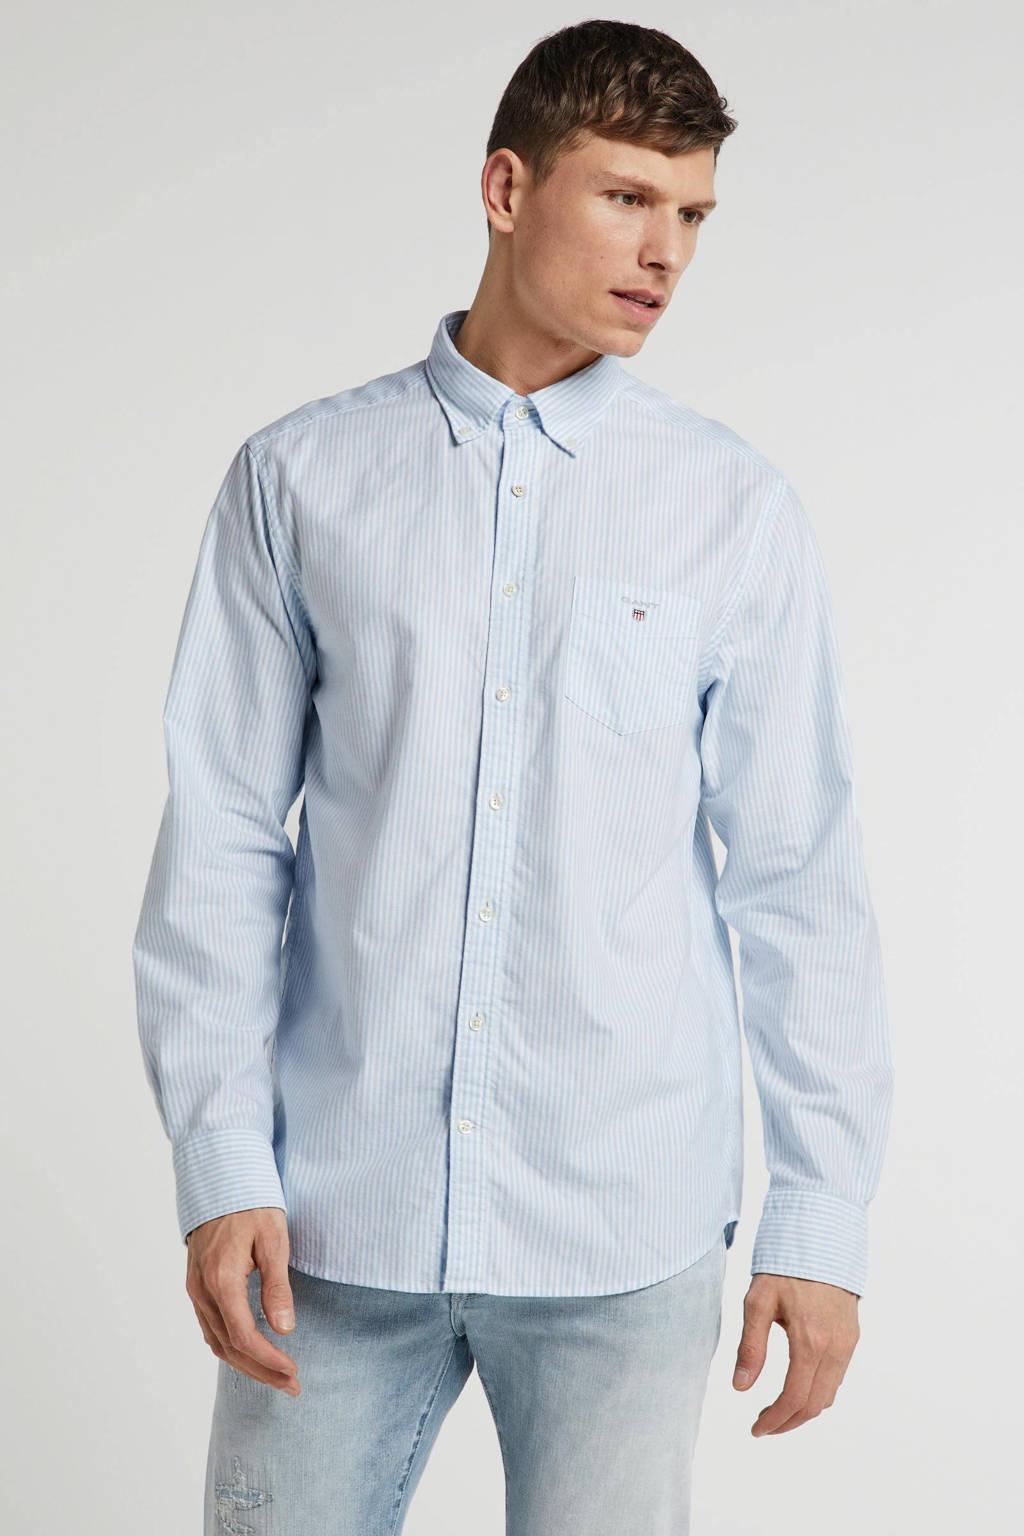 GANT gestreept regular fit overhemd blauw/wit, Blauw/wit